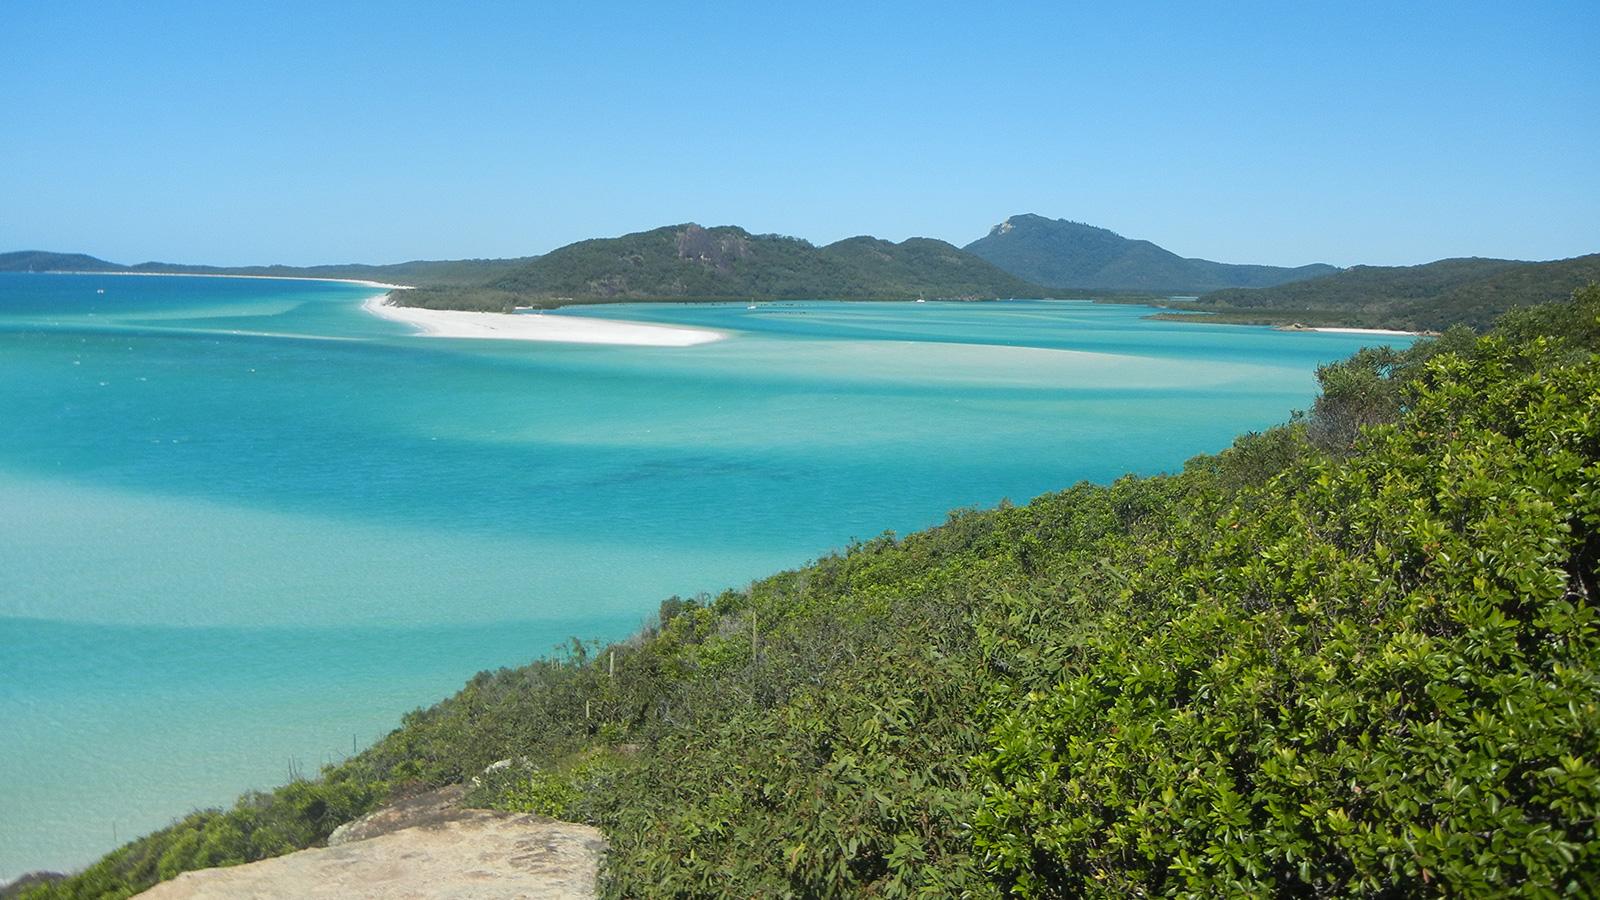 Abenteuer Australien: The Whitsundays